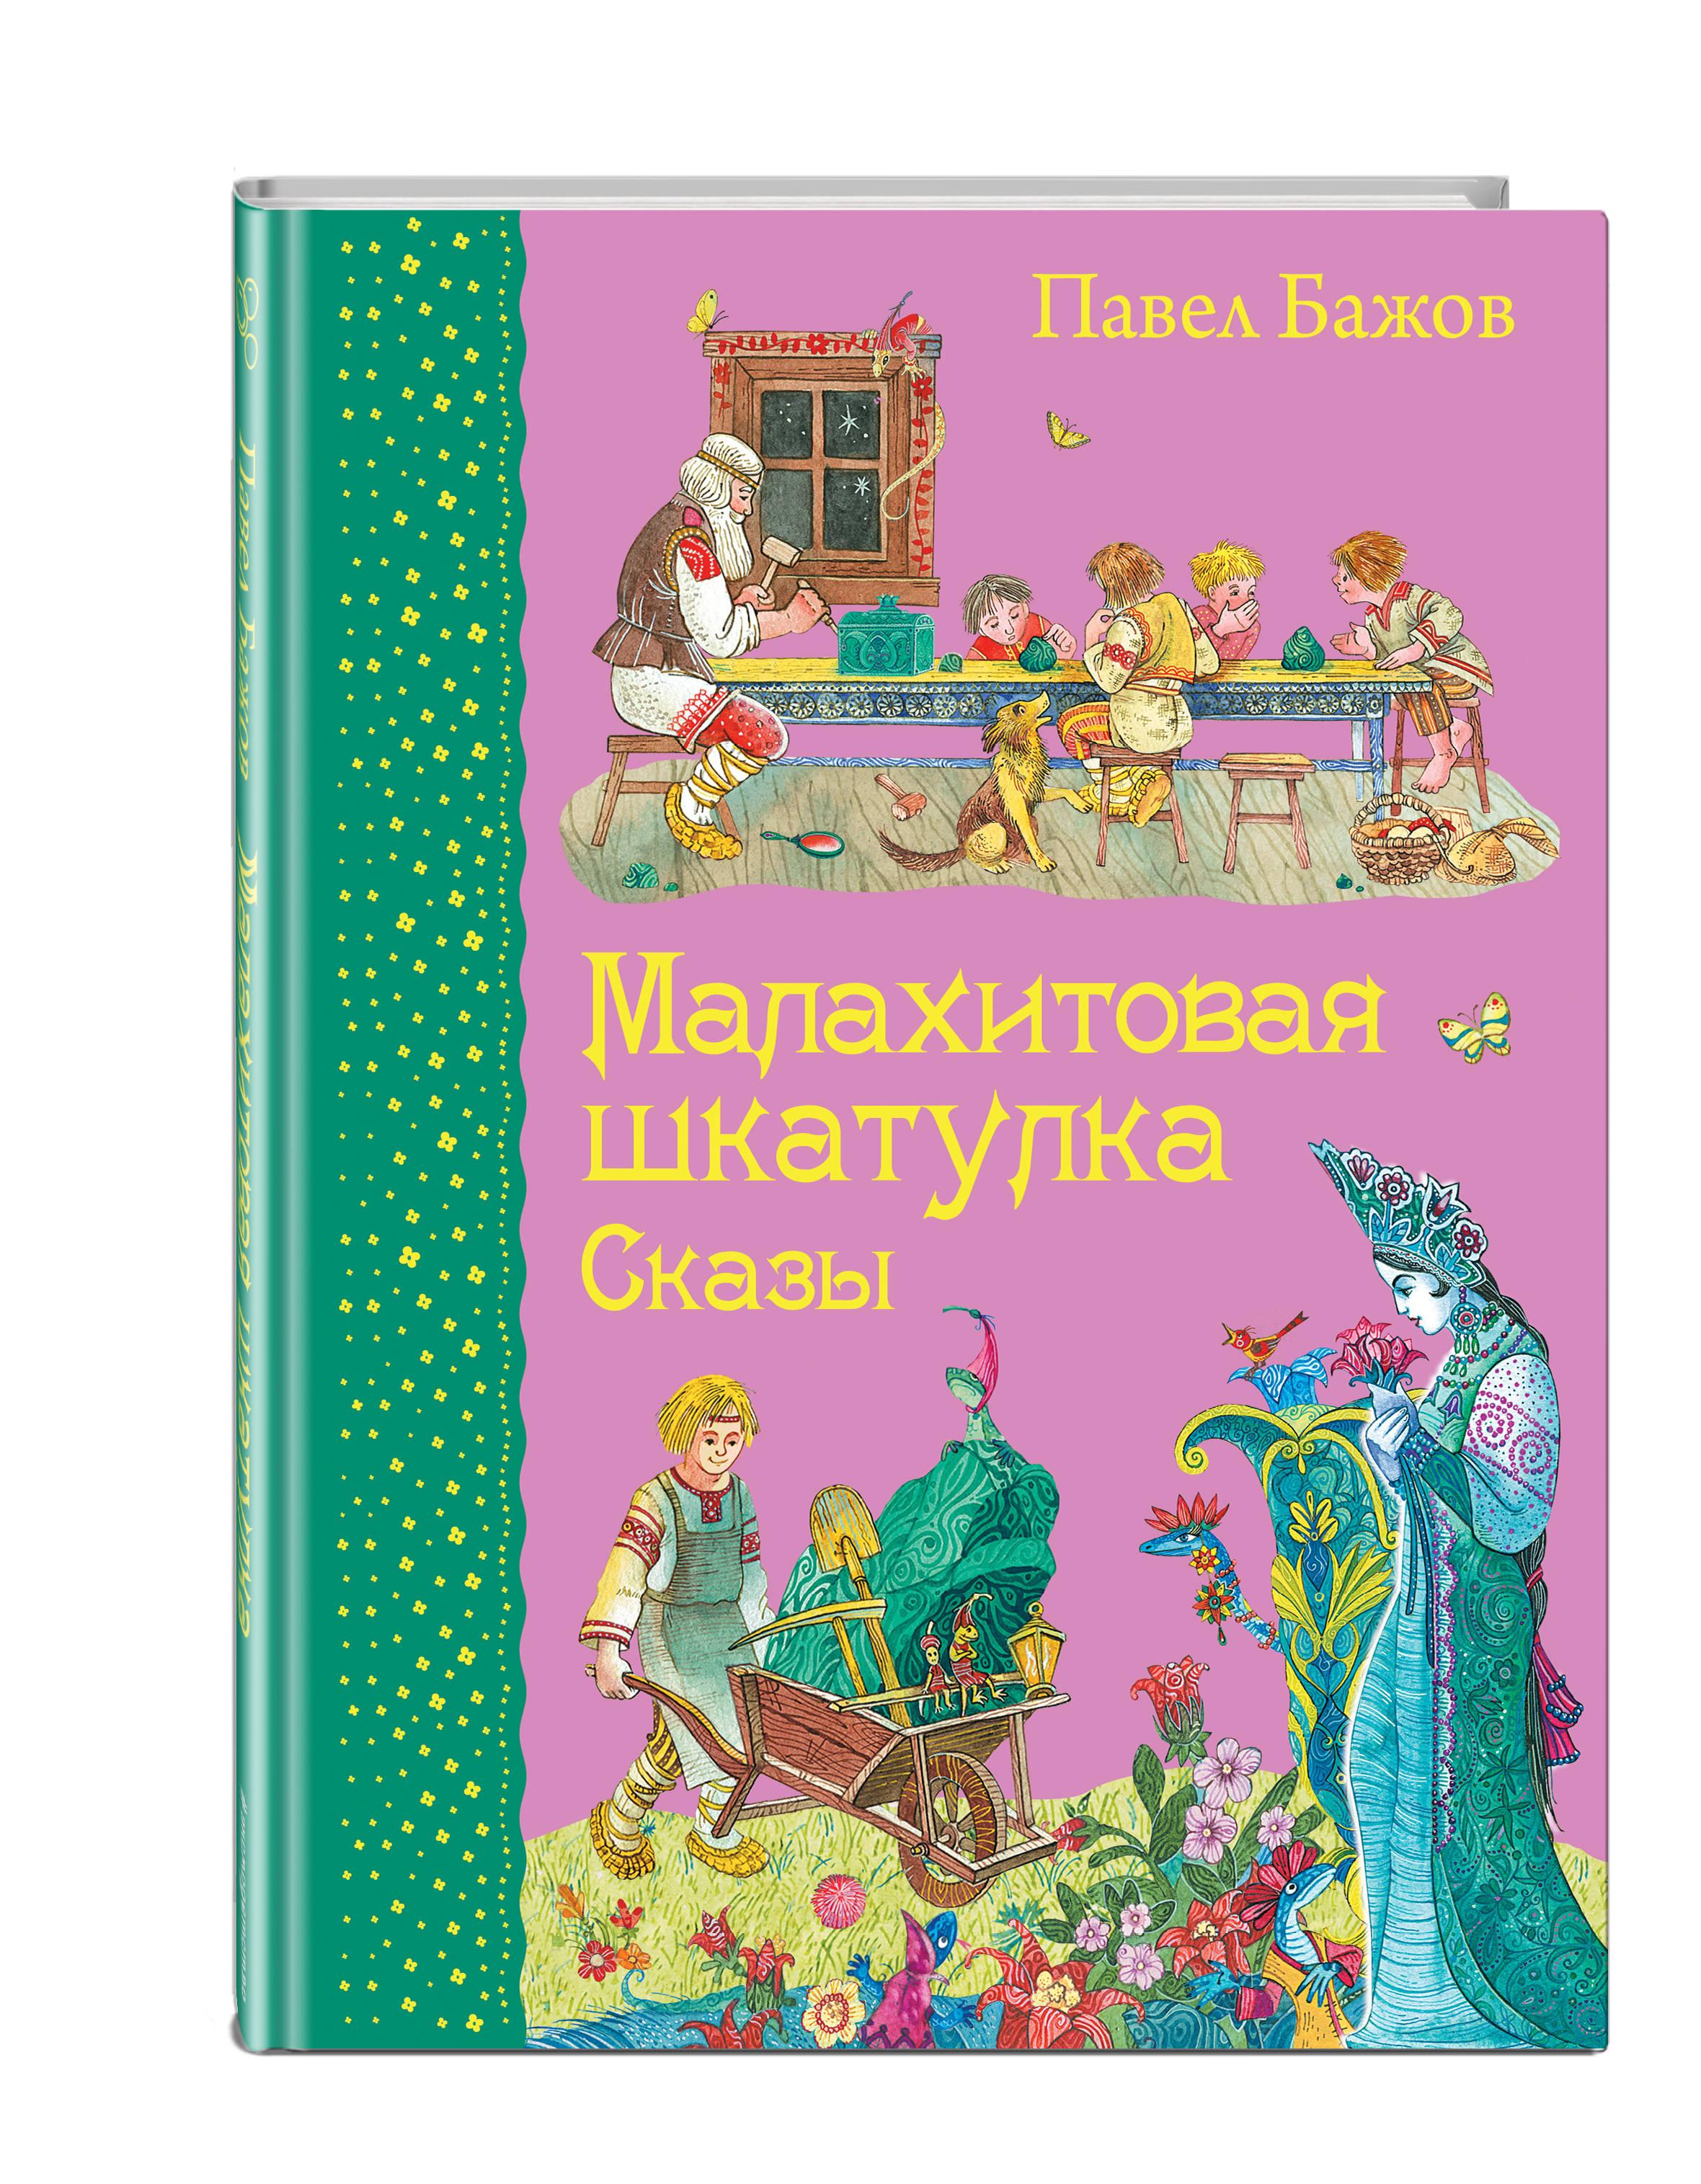 Павел Бажов Малахитовая шкатулка. Сказы (ил. М. Митрофанова) rk3188a cpu